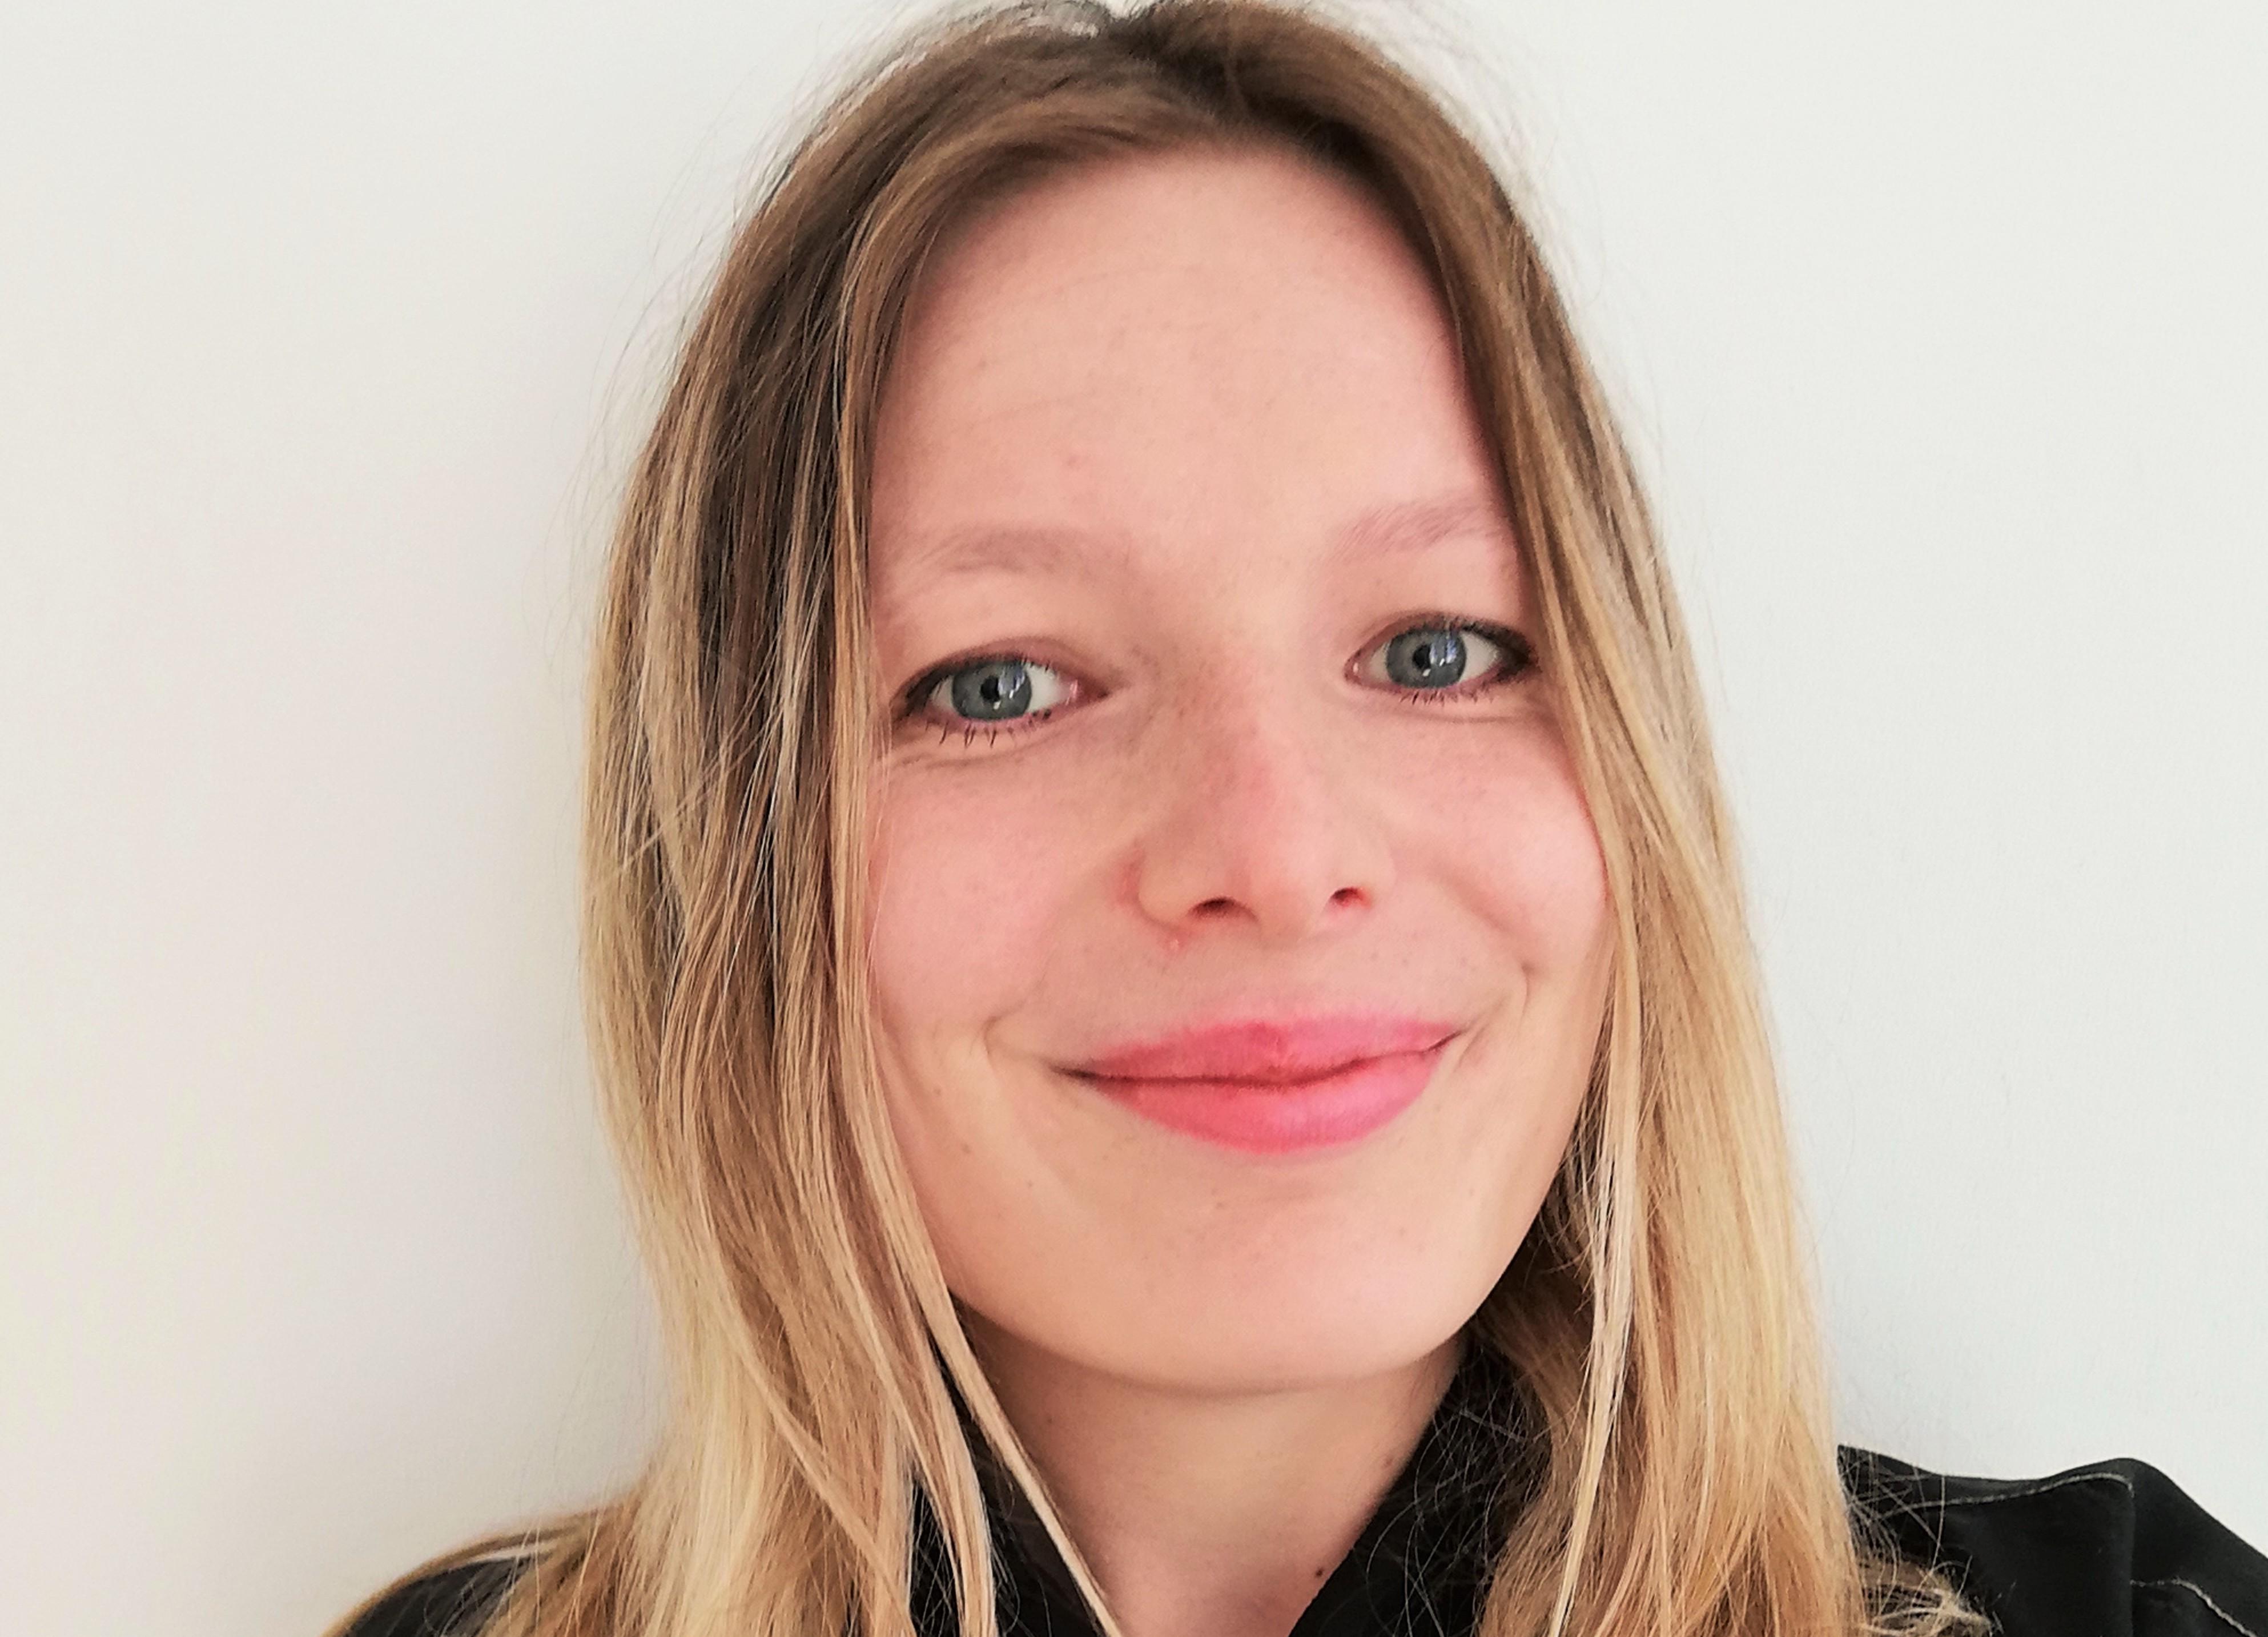 Clara Van der Ropp photo